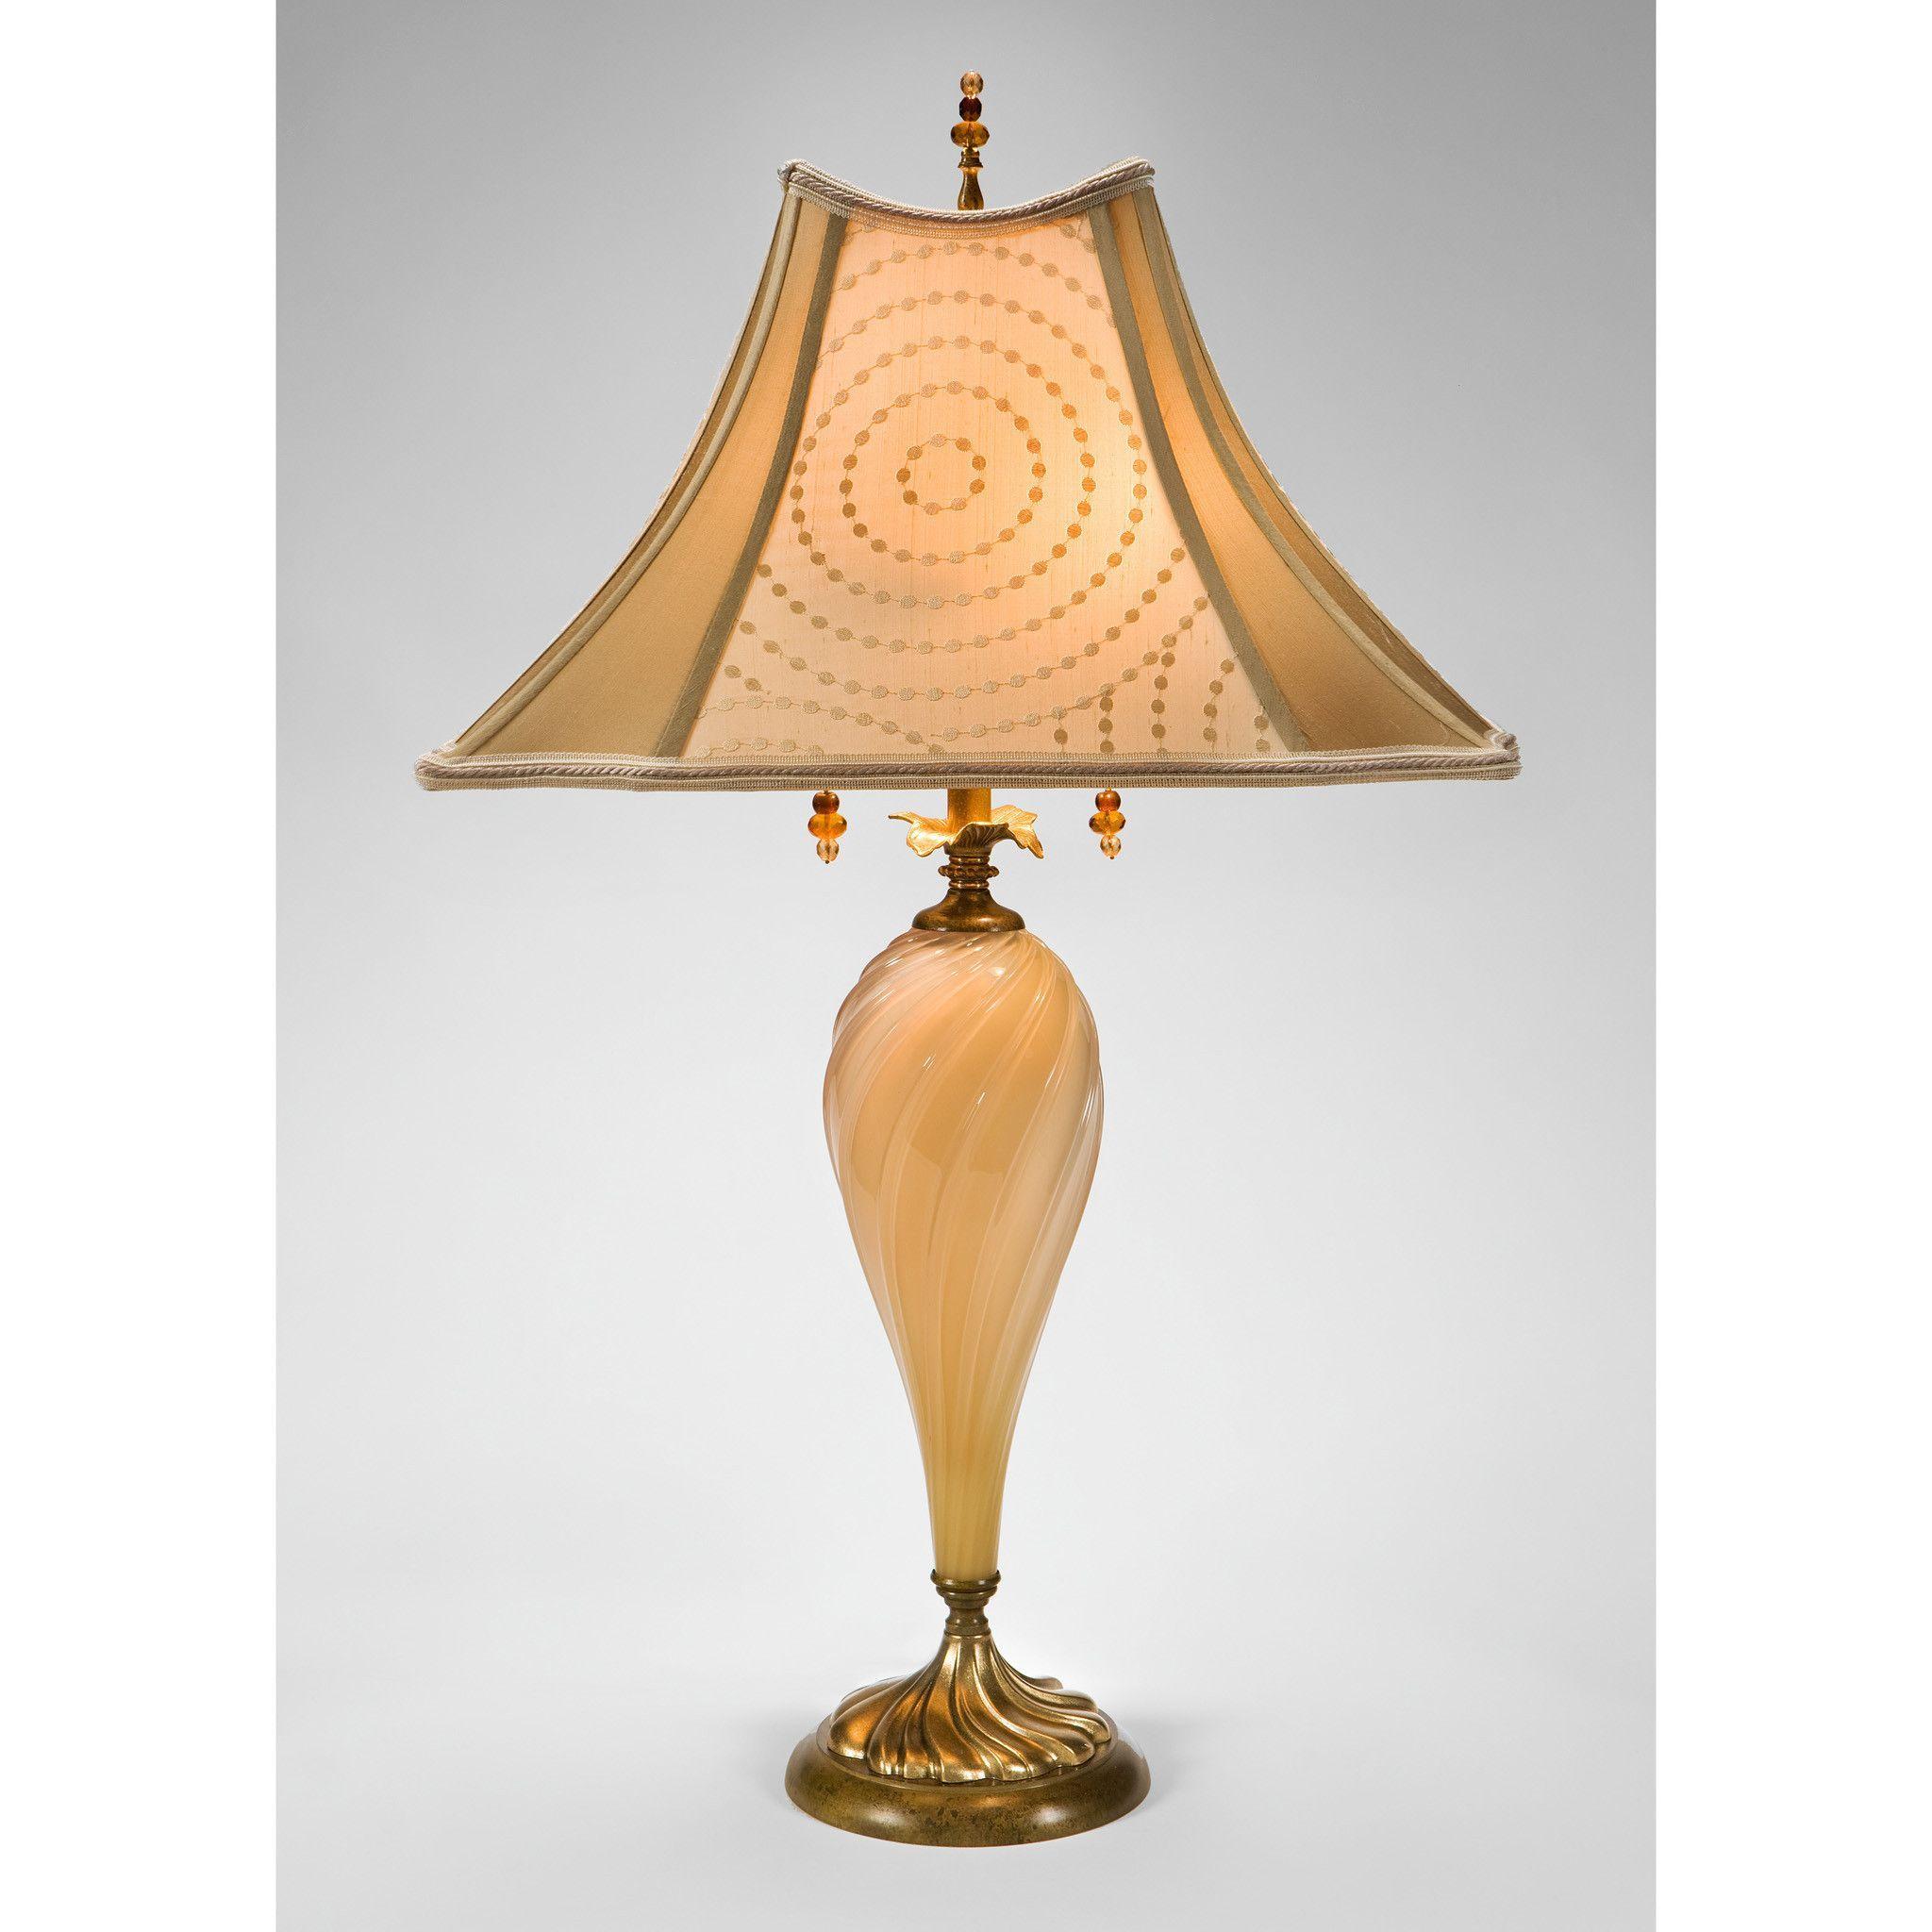 virginia table lamp 62z68 by kinzig design kinzig design lamps rh pinterest com